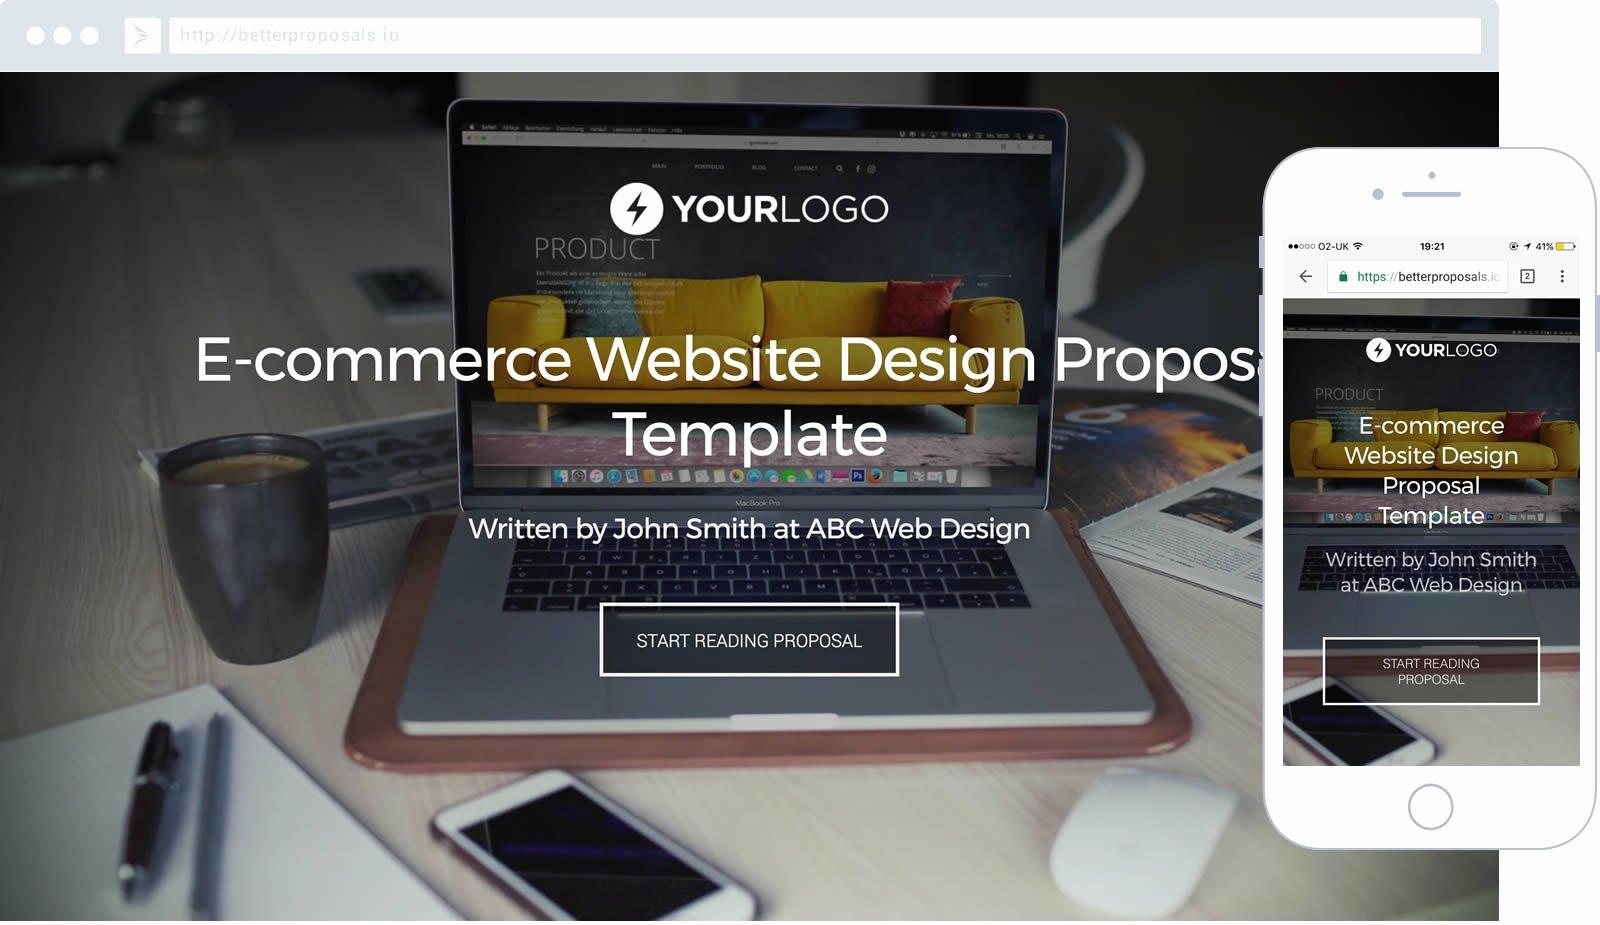 Free Web Design Proposal Template Unique Free E Merce Web Design Proposal Template Better Proposals